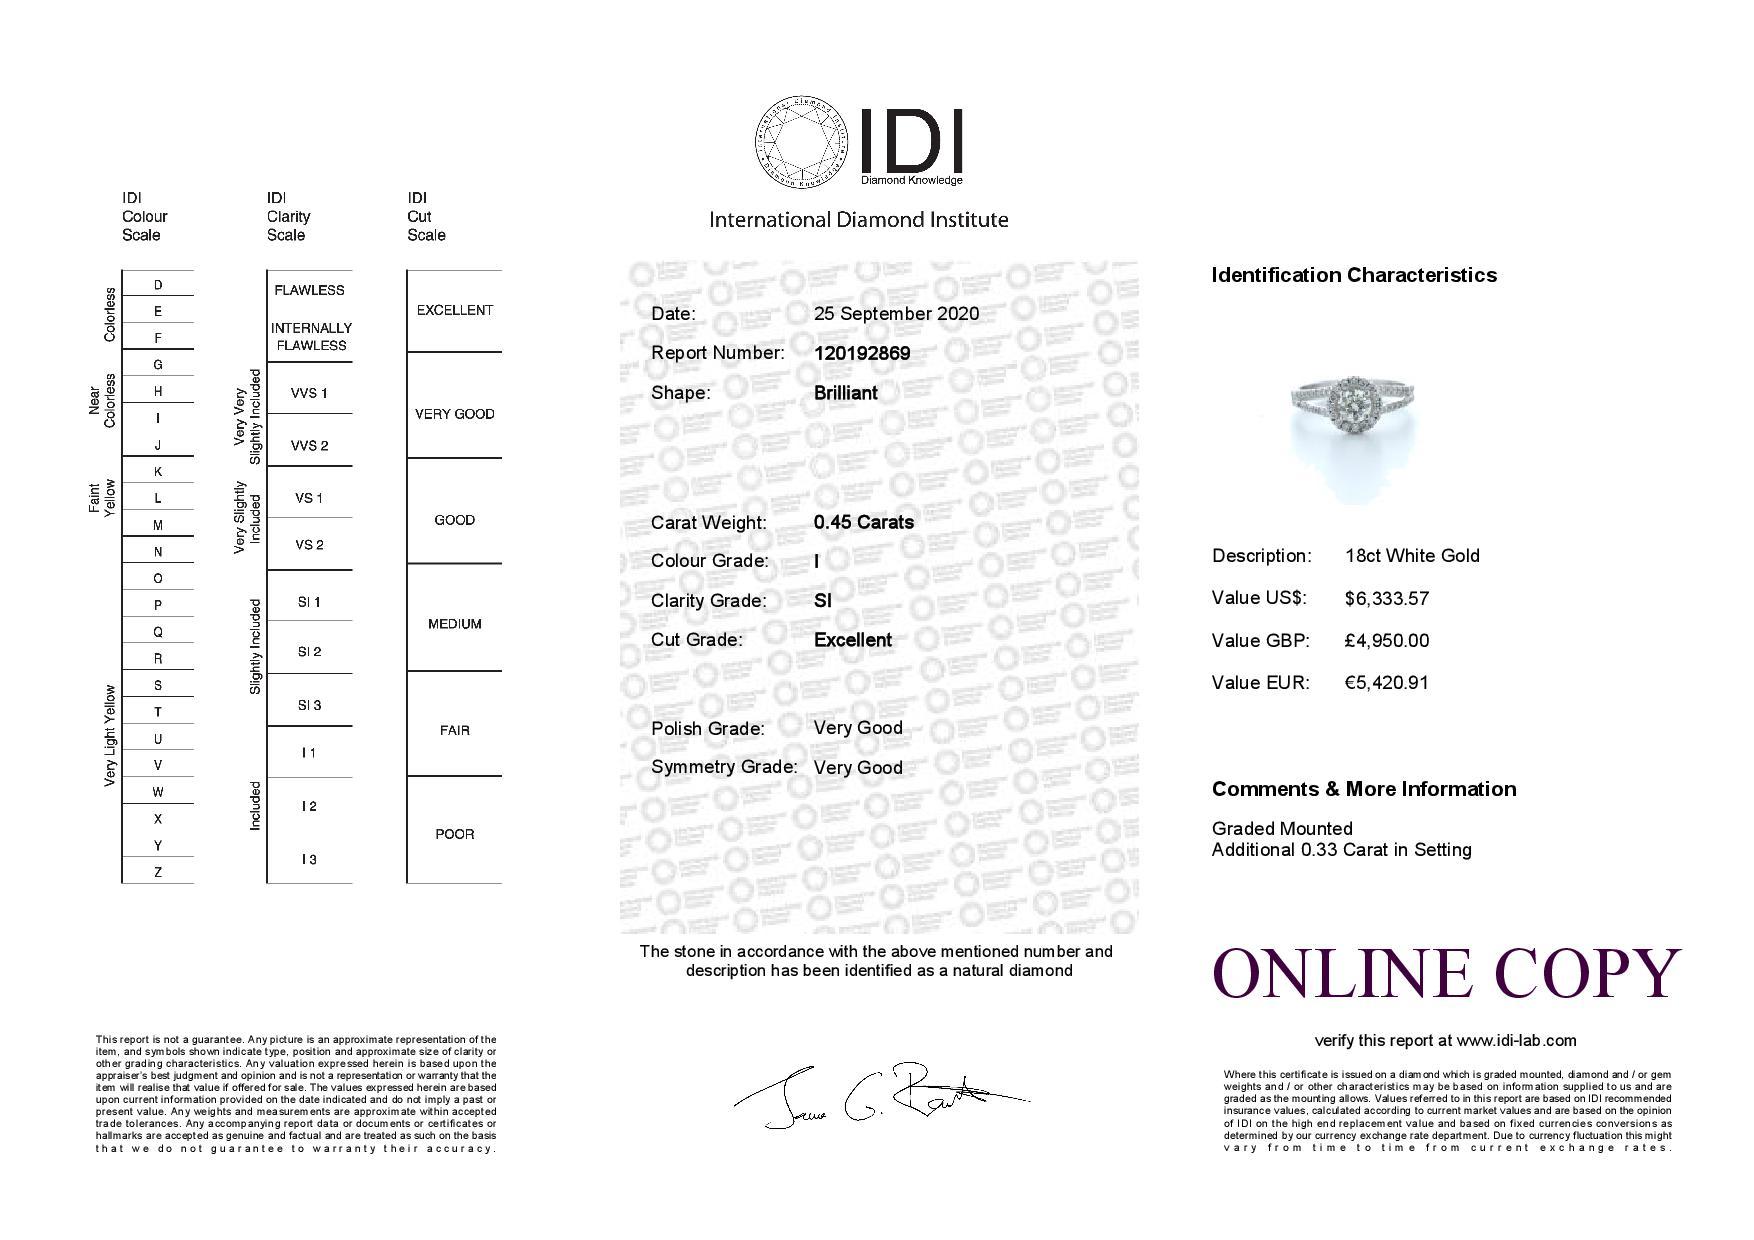 18k White Gold Single Stone With Halo Setting Ring 0.78 (0.45) Carats - Image 5 of 5